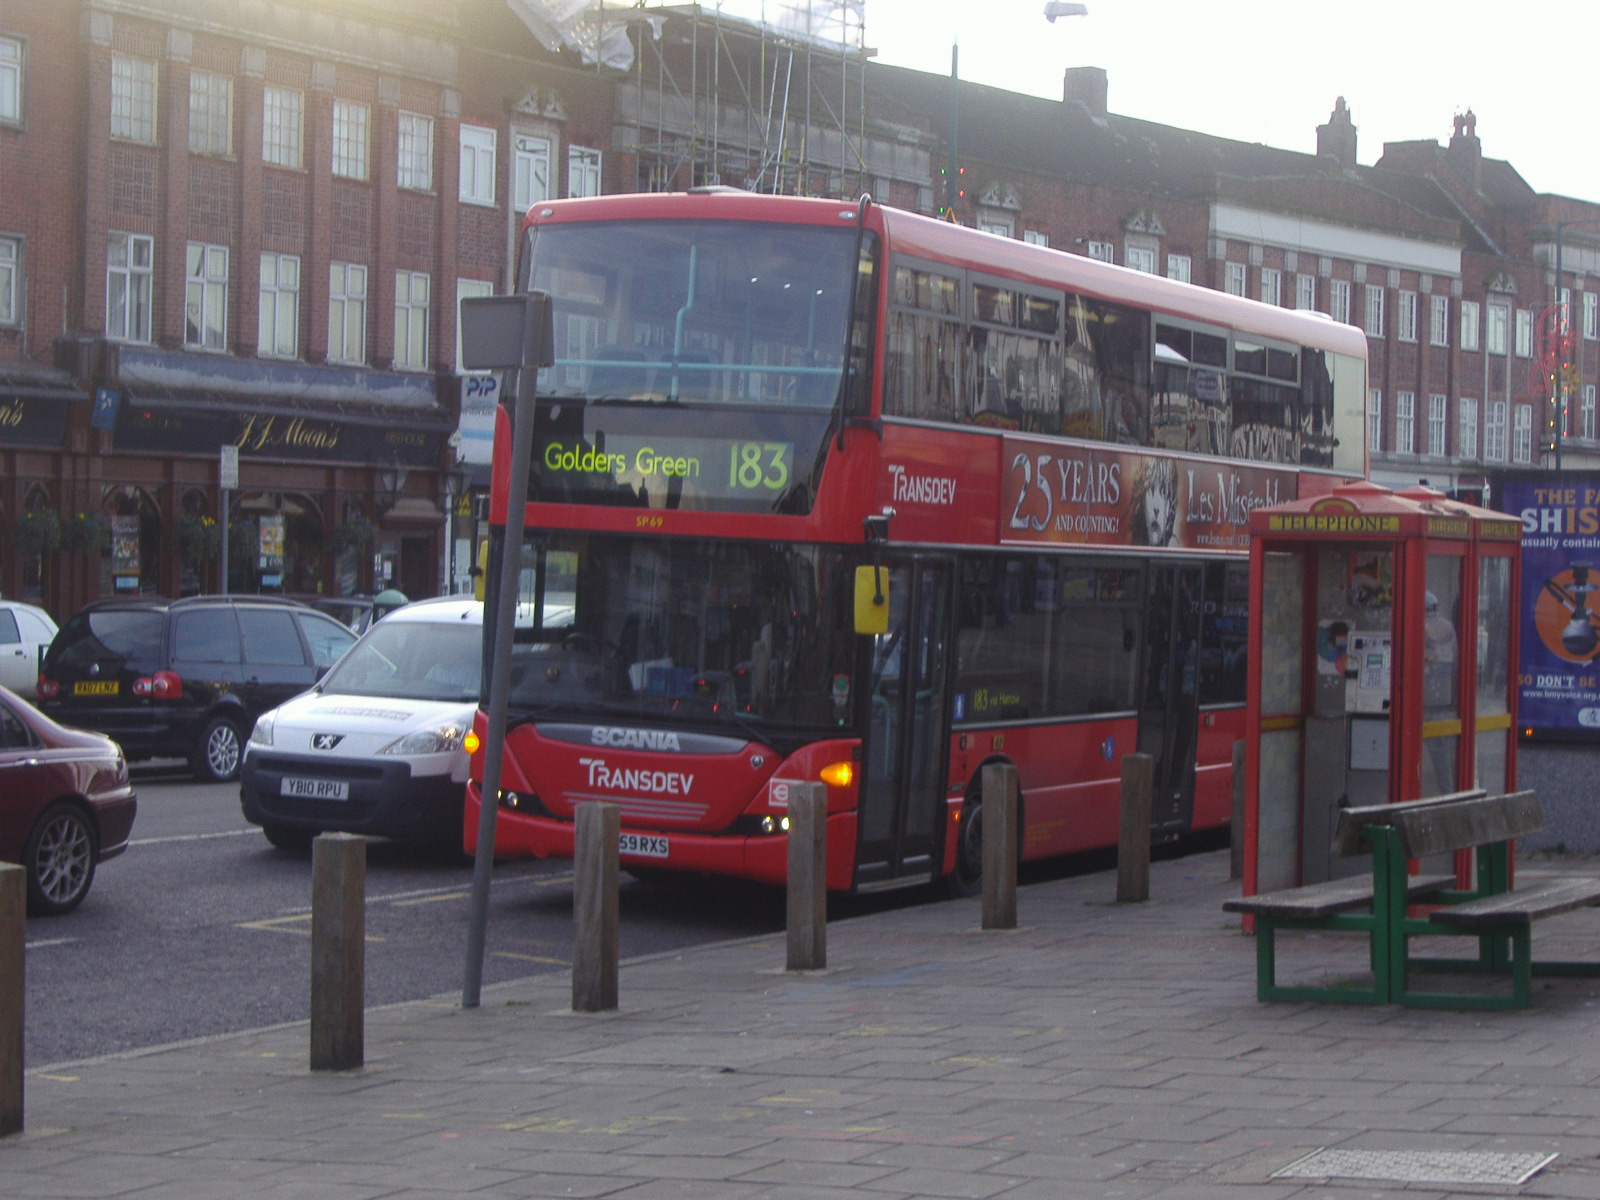 File:183 bus on Kingsbury Road jpg - Wikimedia Commons